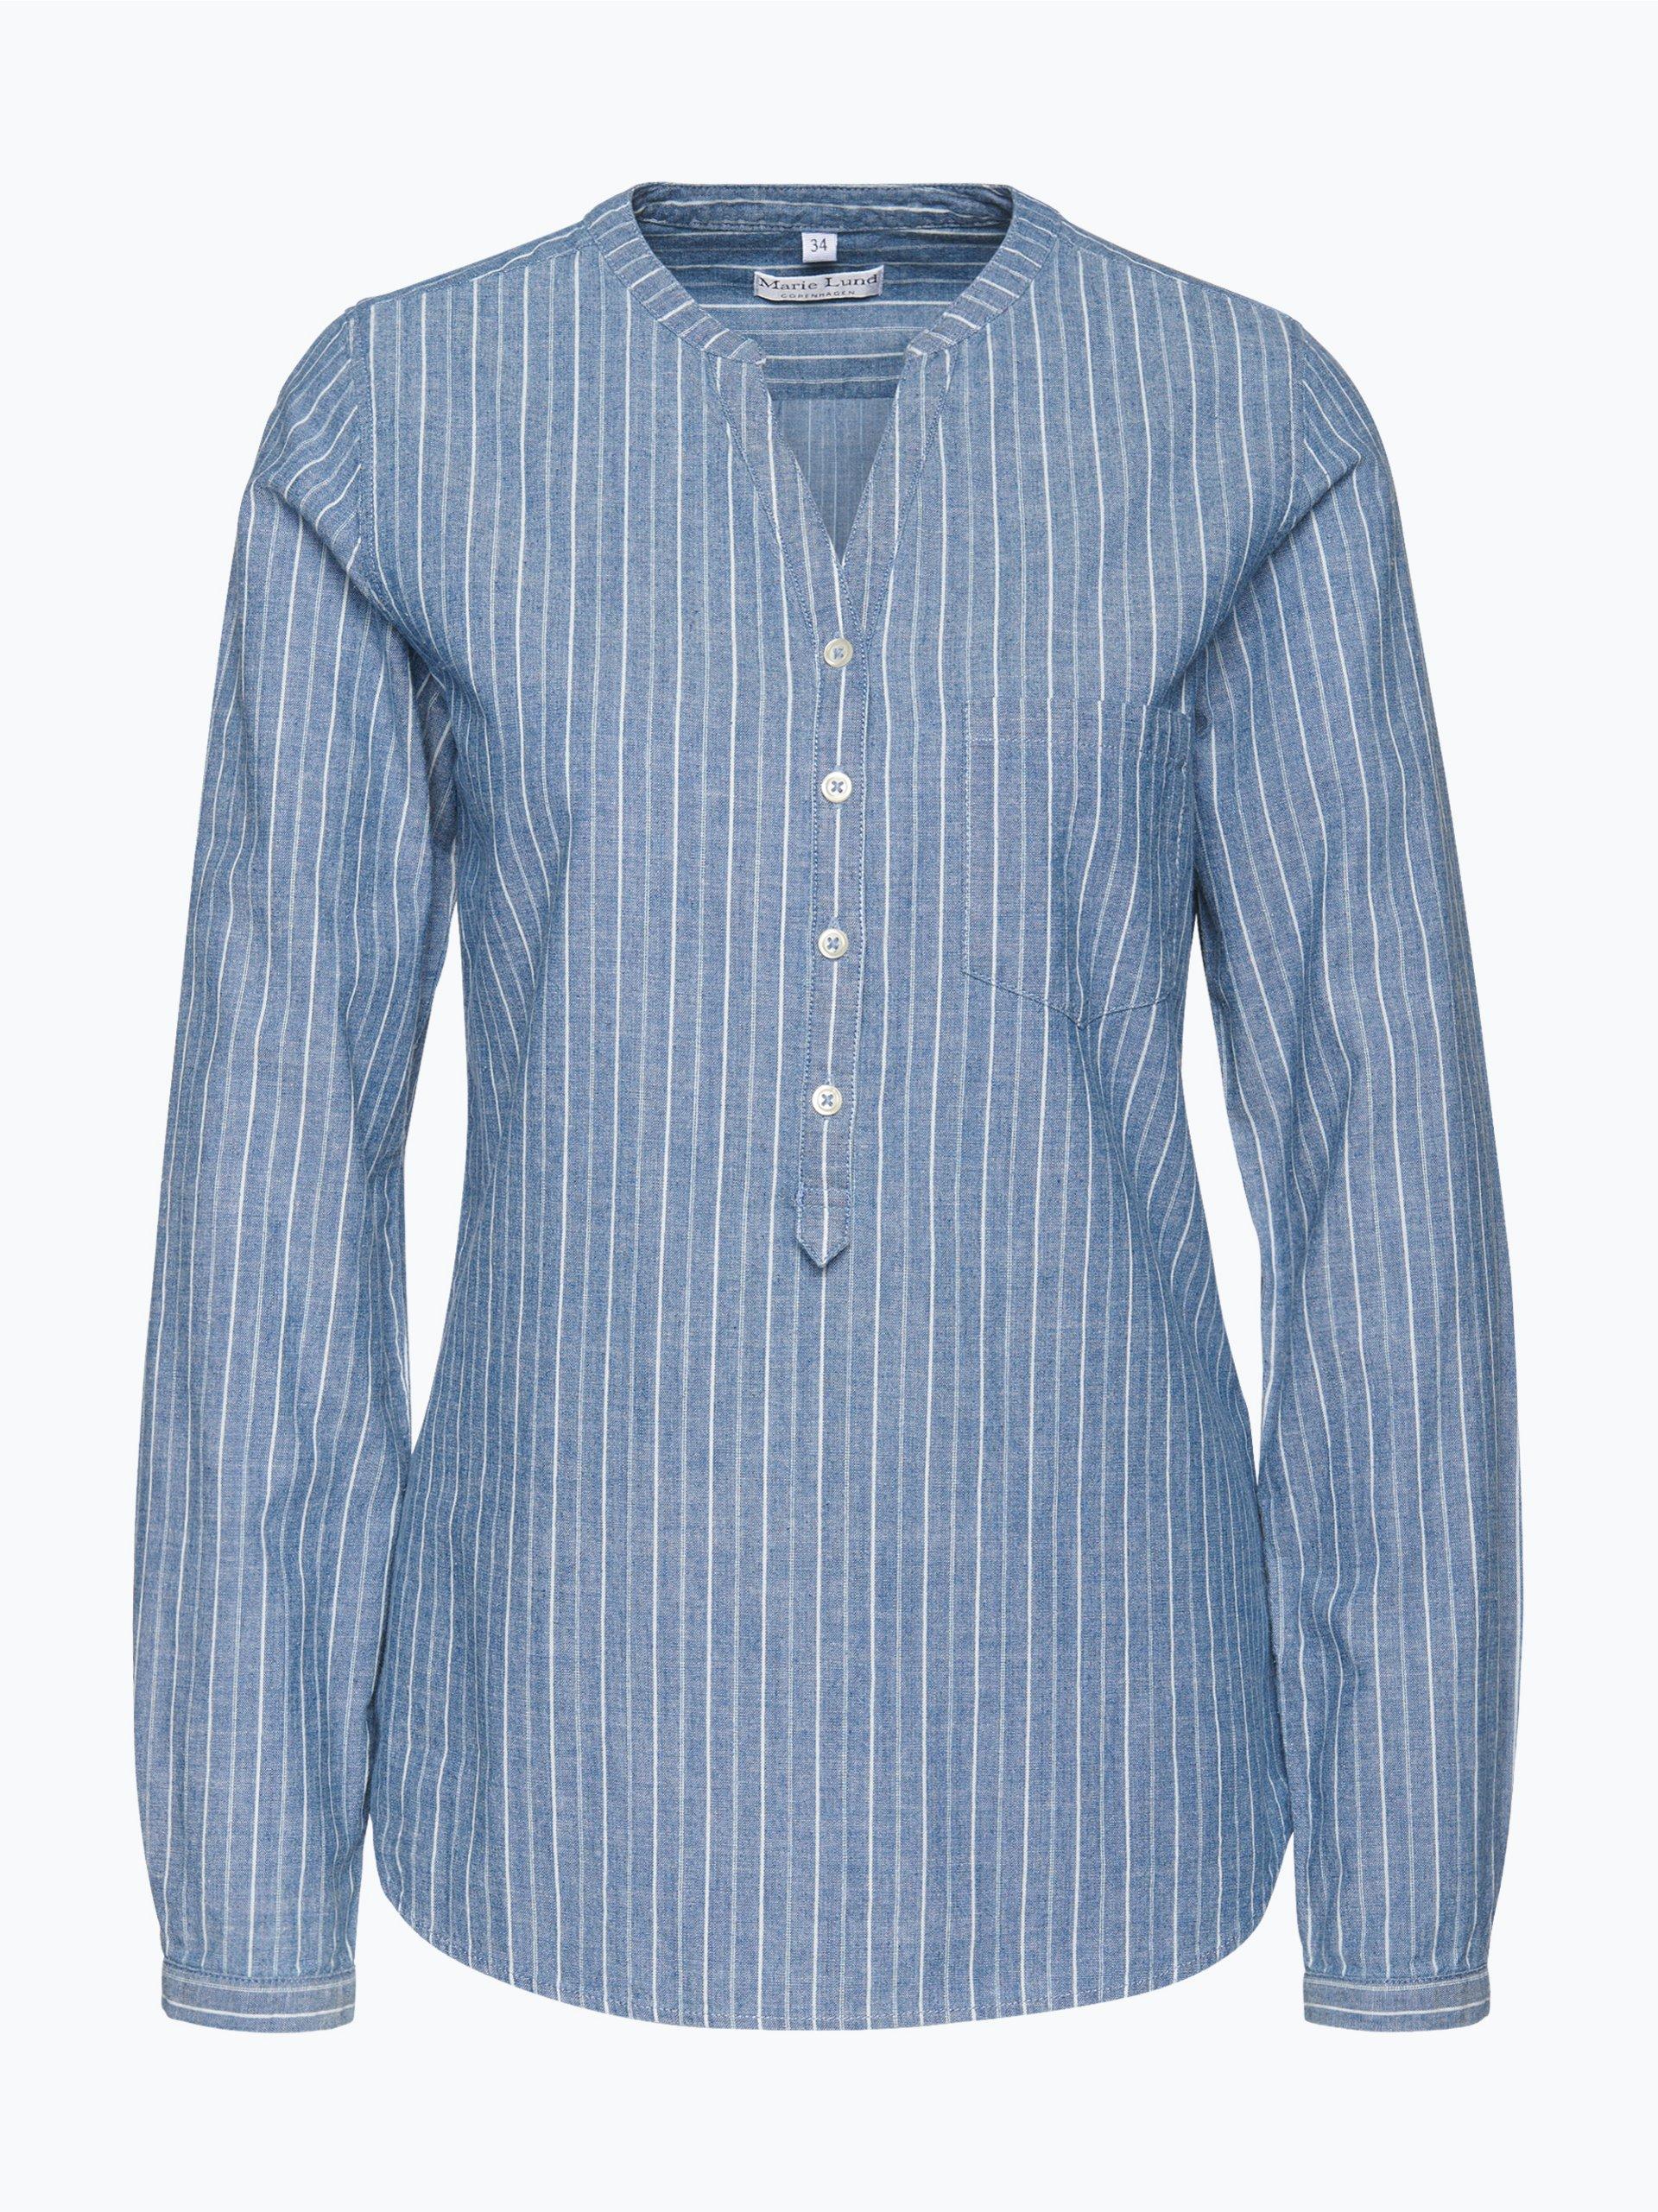 marie lund damen jeansbluse blau gestreift online kaufen vangraaf com. Black Bedroom Furniture Sets. Home Design Ideas